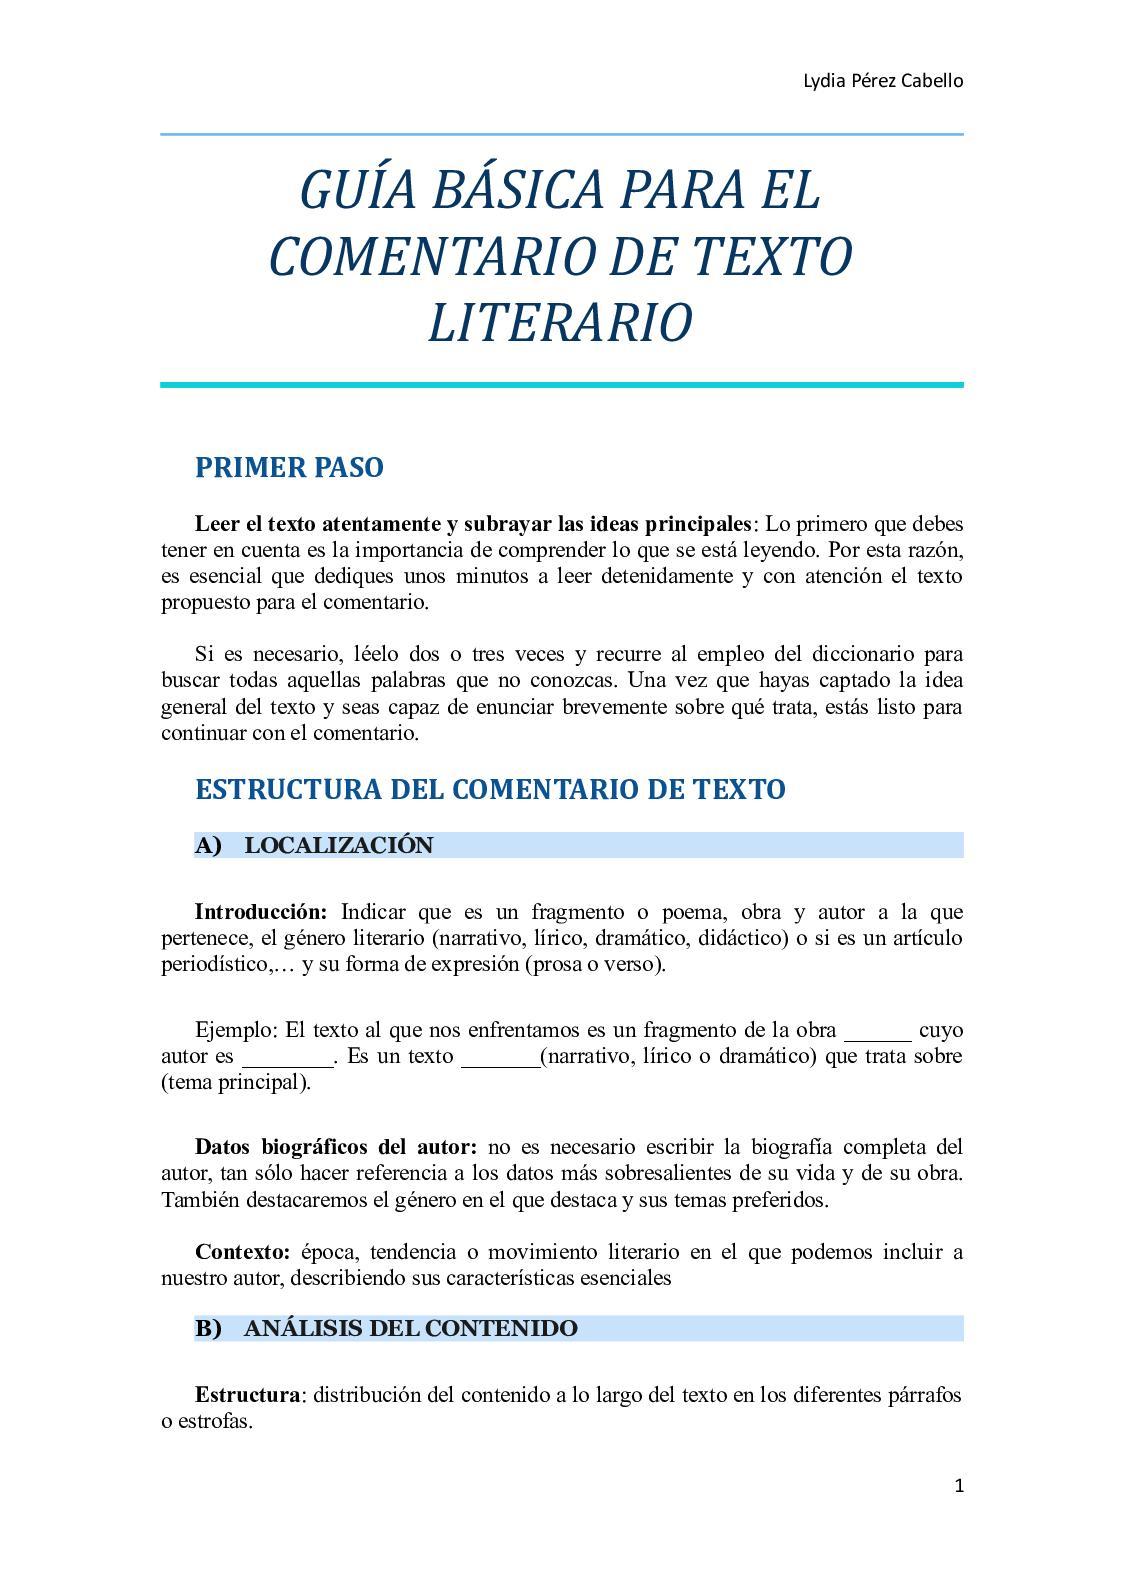 Calaméo Lydia Guía Básica Para El Comentario De Texto